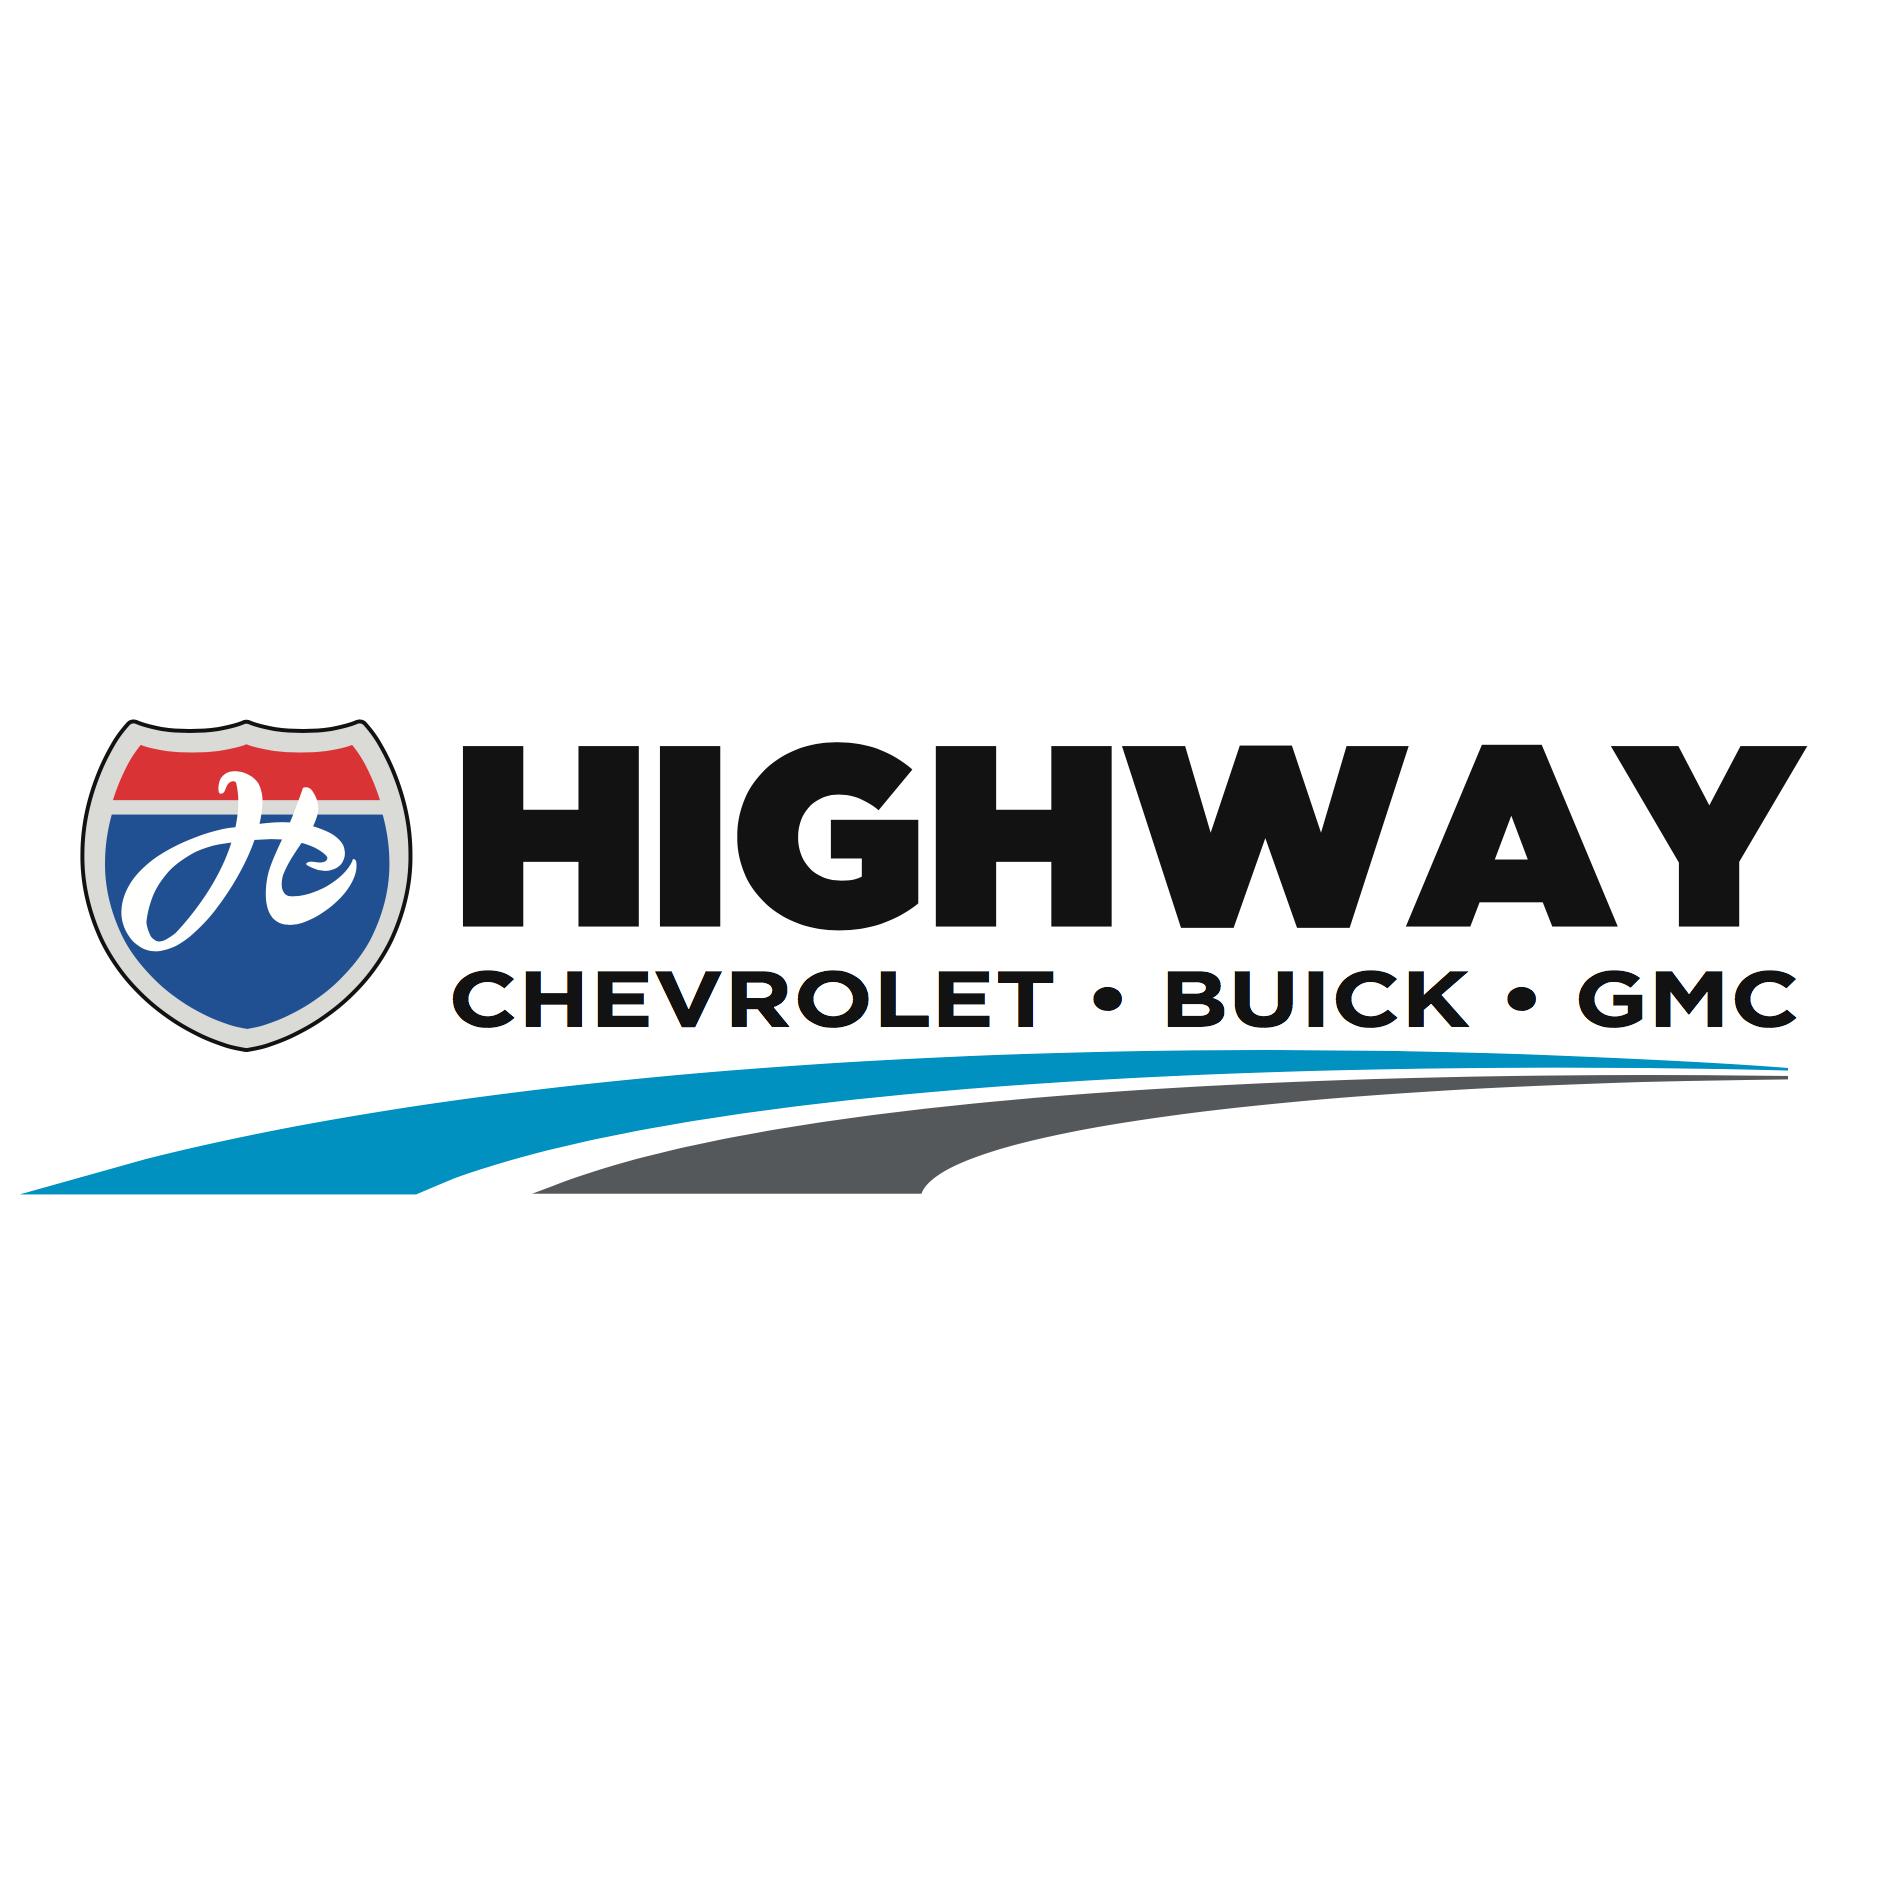 Highway Chevrolet Buick GMC - El Paso, IL - Auto Dealers